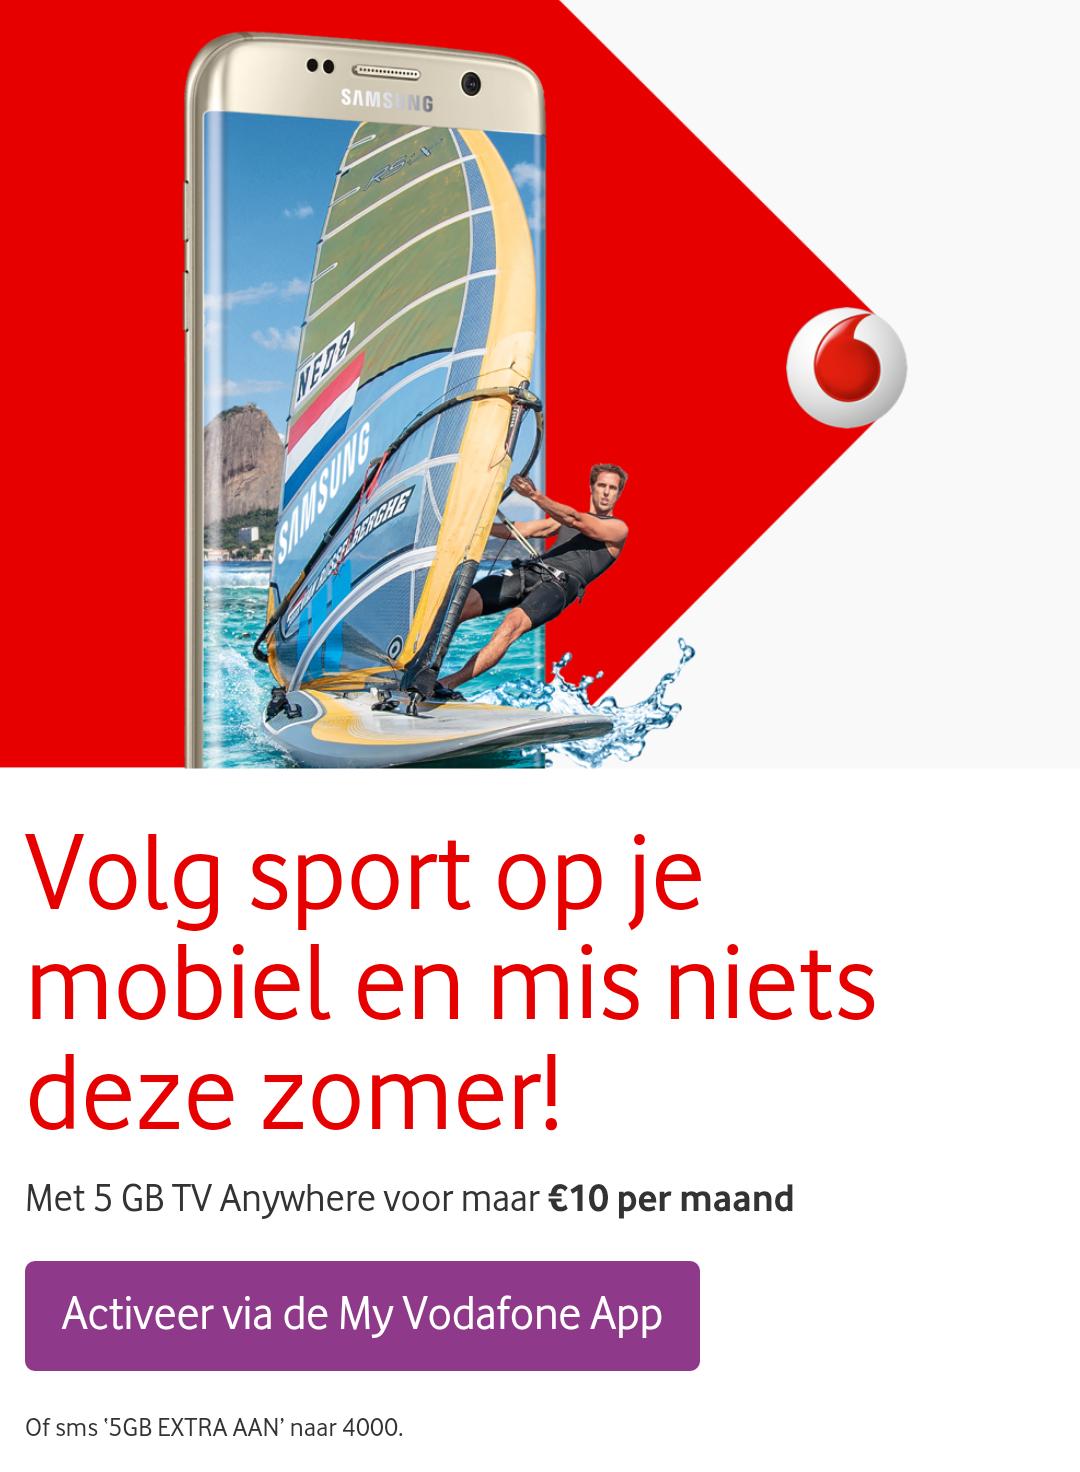 5 GB TV Anywhere voor €10 per maand @ Vodafone